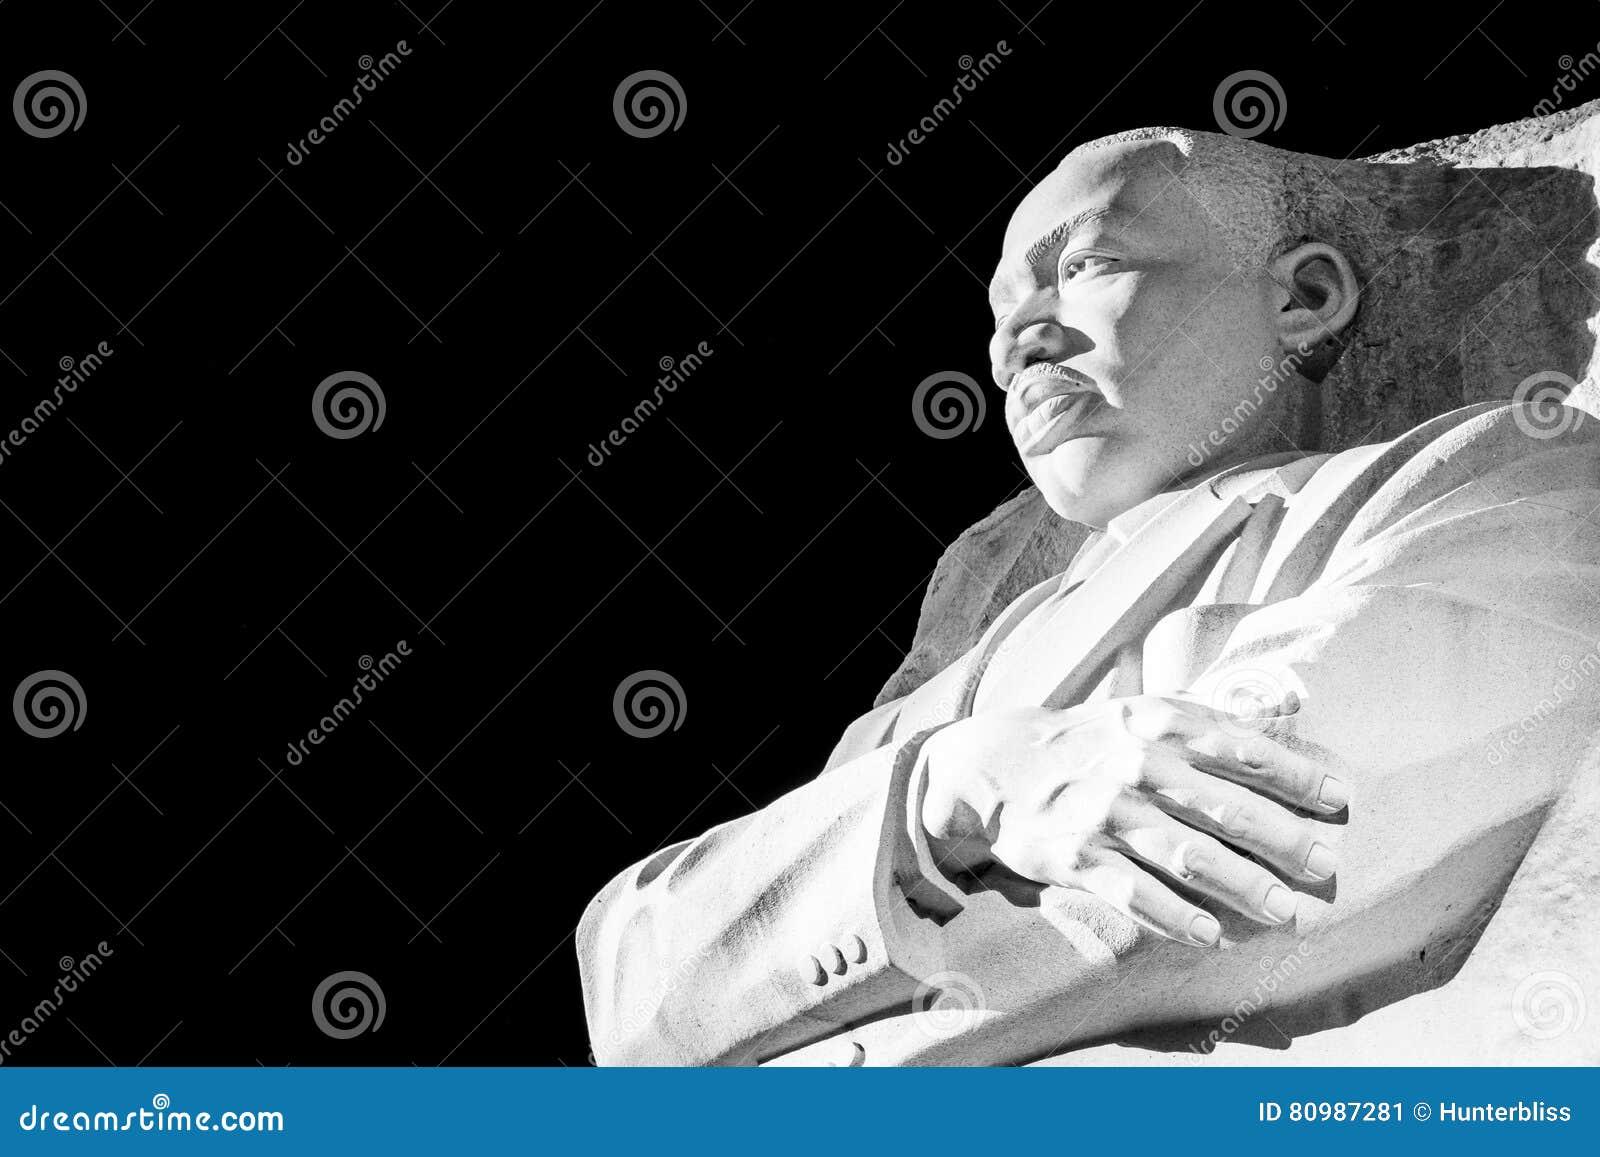 Martin Luther King Jr Memorial Statue Washington DC Night Evening Closeup